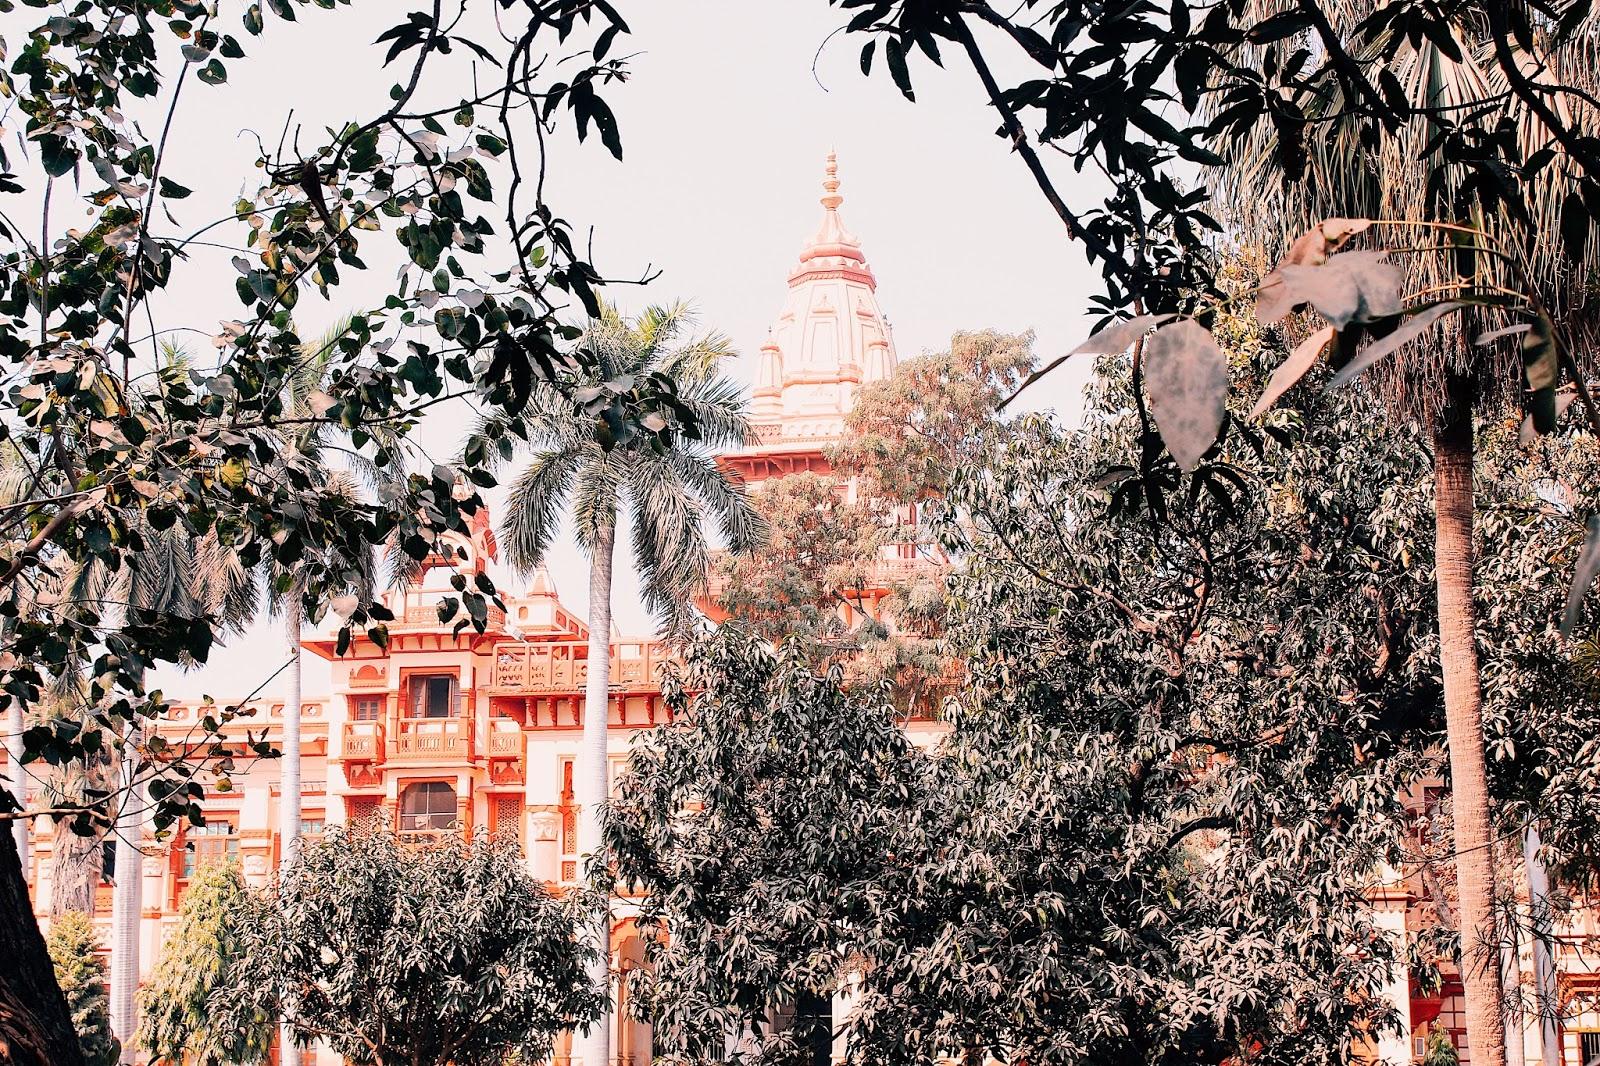 benares hindu university, bhu, varanasi travel guide, vranasai information, tips on varanasi, travel varanasi, spiritual capital of india, city of temples, indian travel blogger, uk blog, benares travel